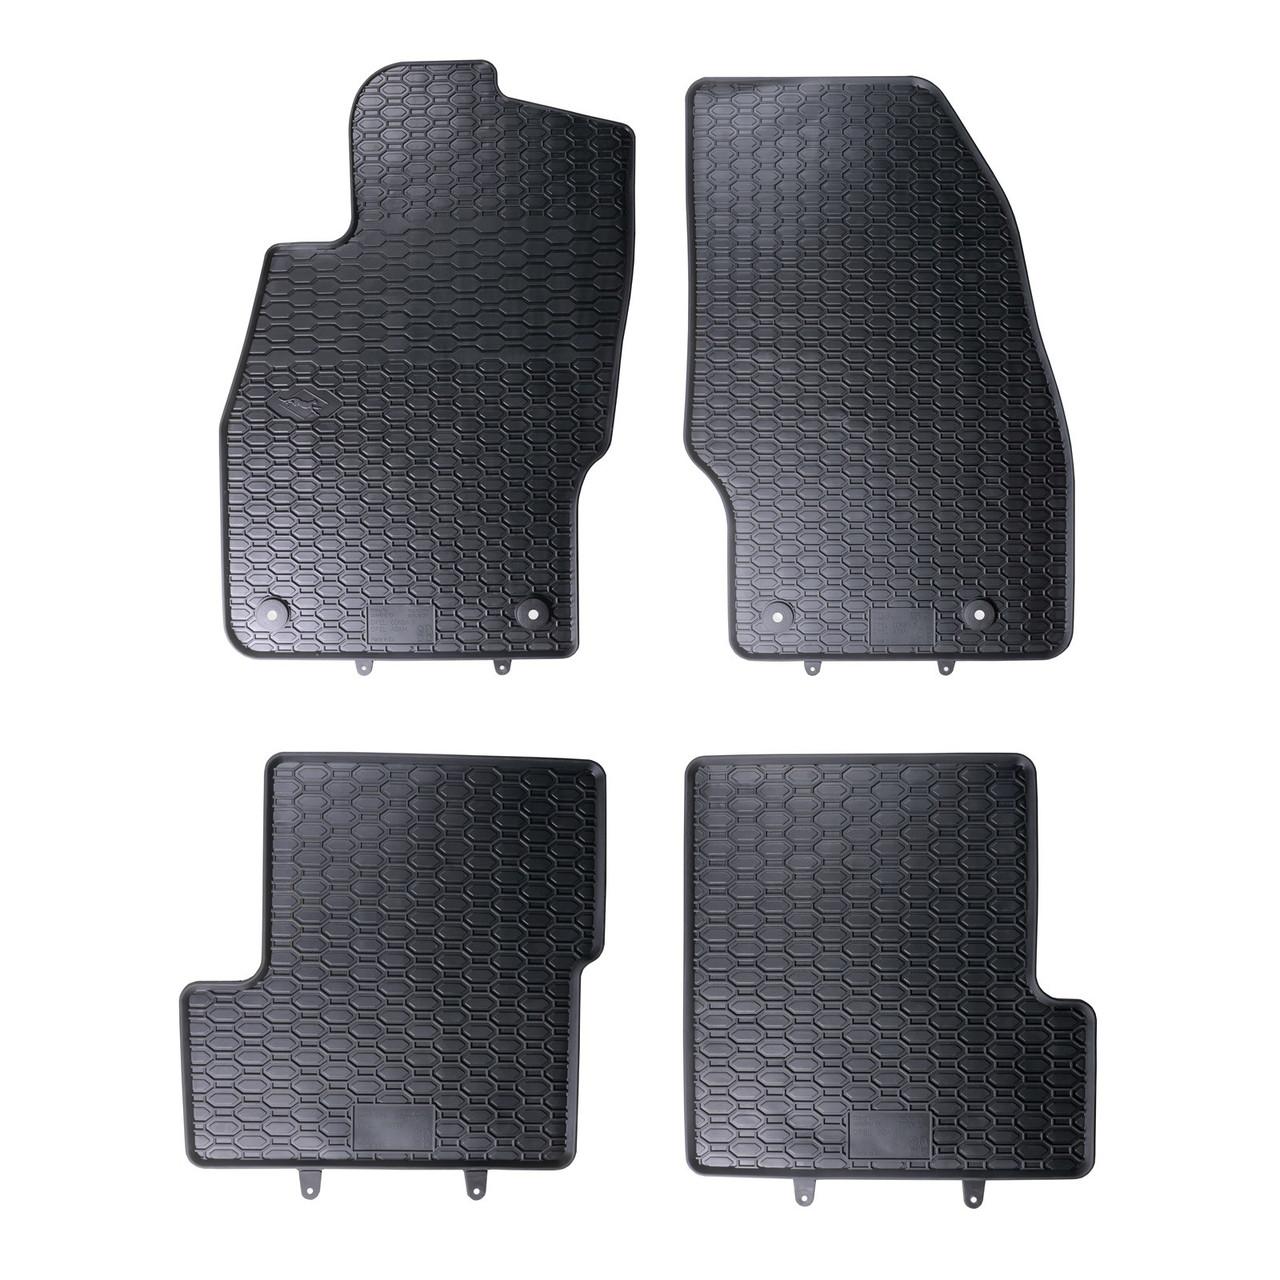 Килимки в салон для Opel CORSA D (06-) / CORSA E (14-) (4шт) 802/4C